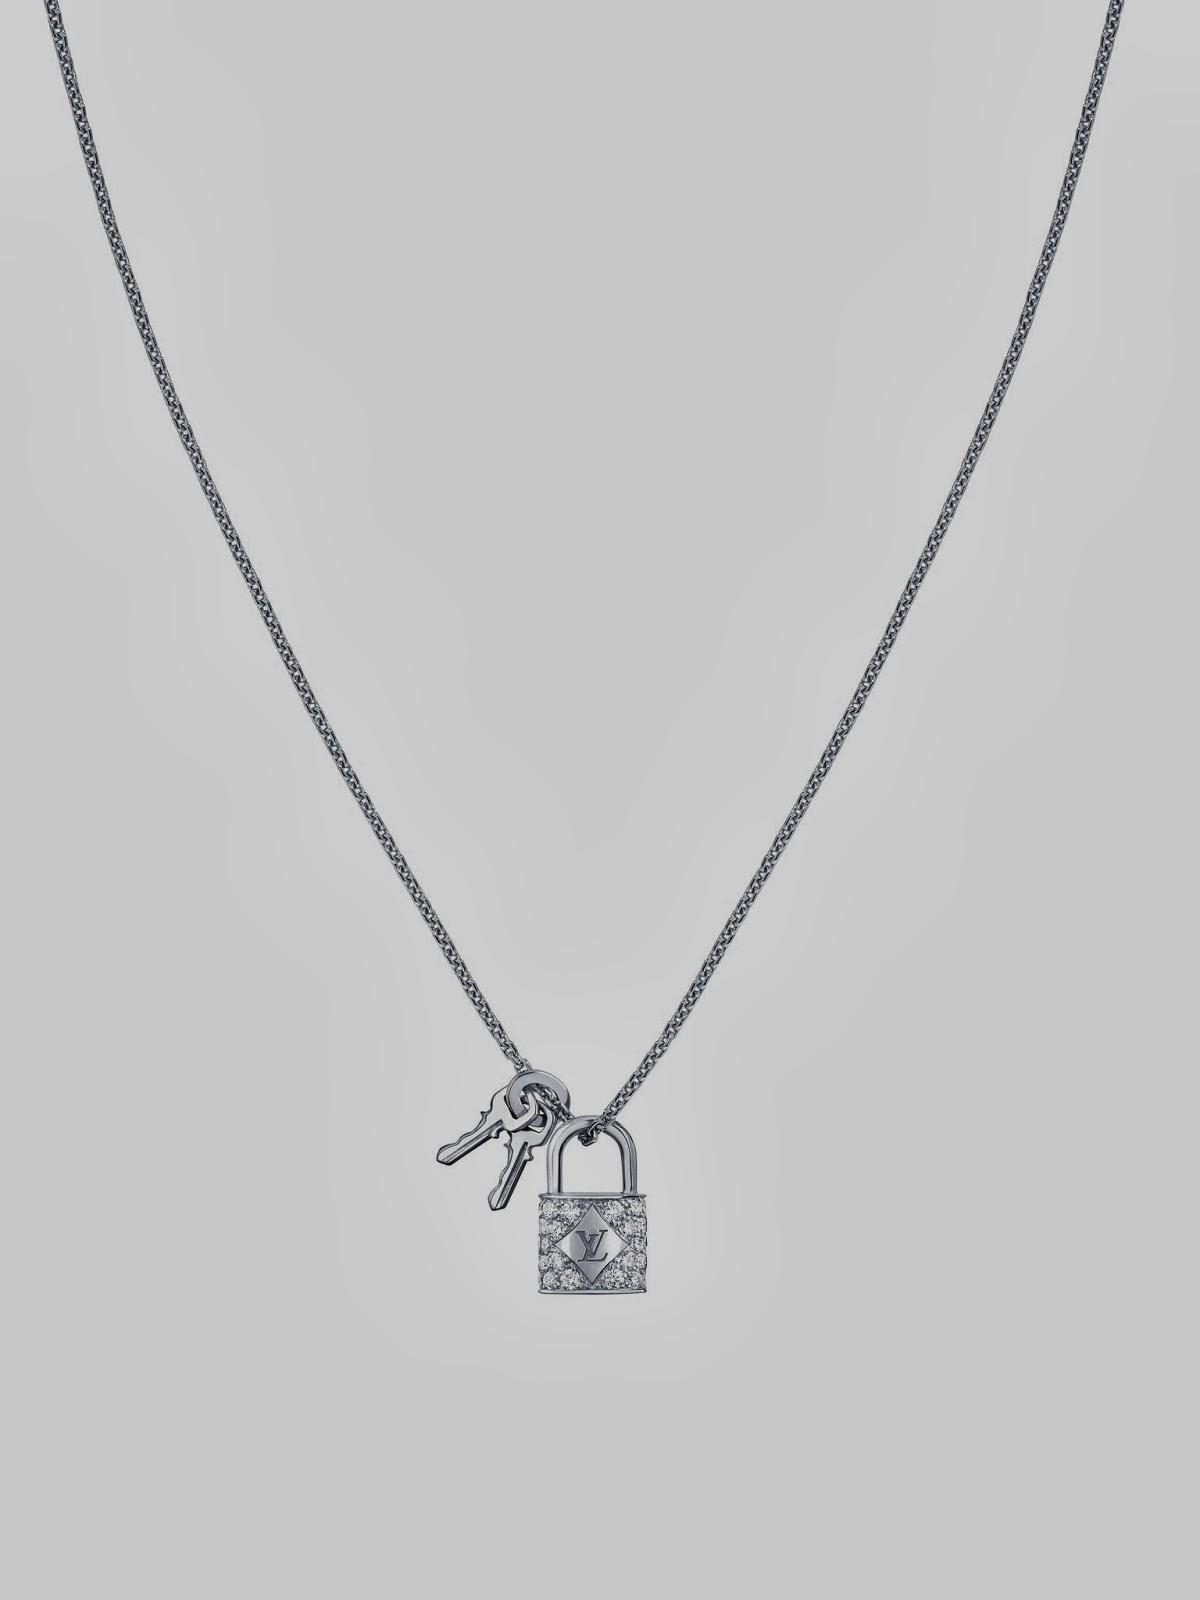 Louis Vuitton Lockit Fine Jewellery Collection